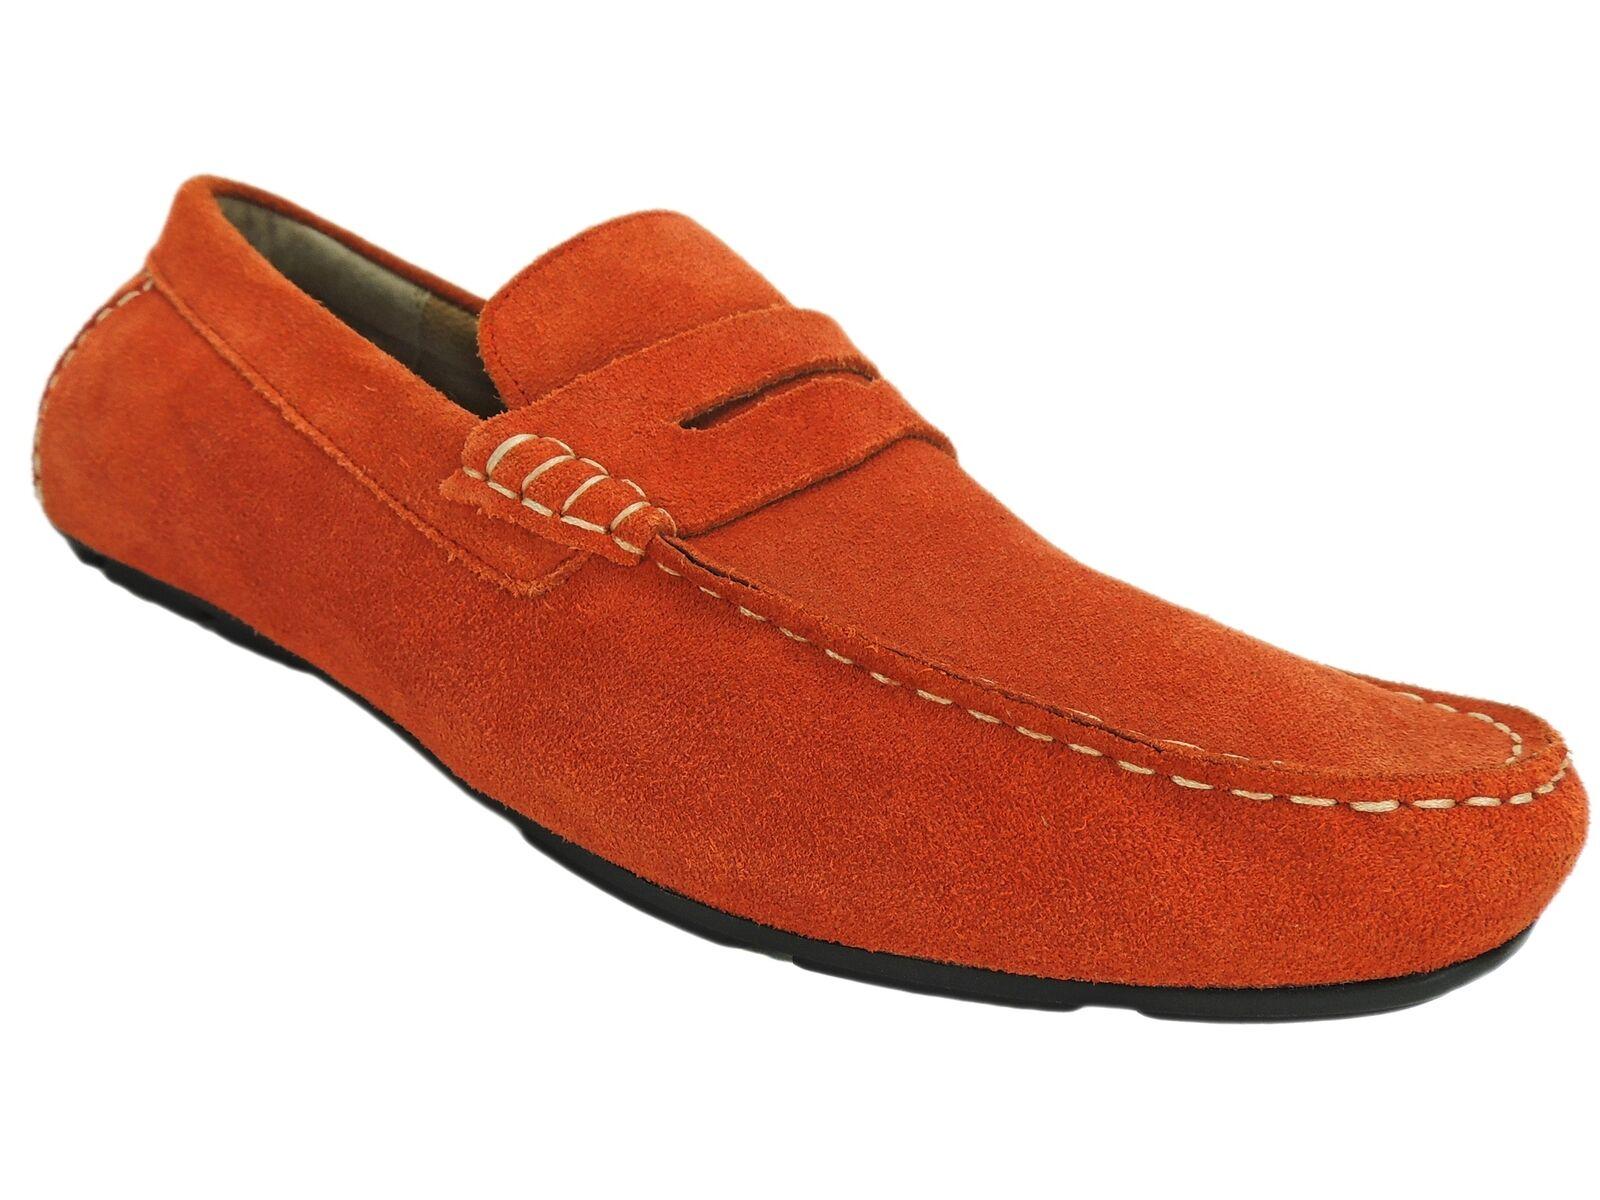 Alfani Men's Sal Suede Penny Drivers orange Crush Size 13 M